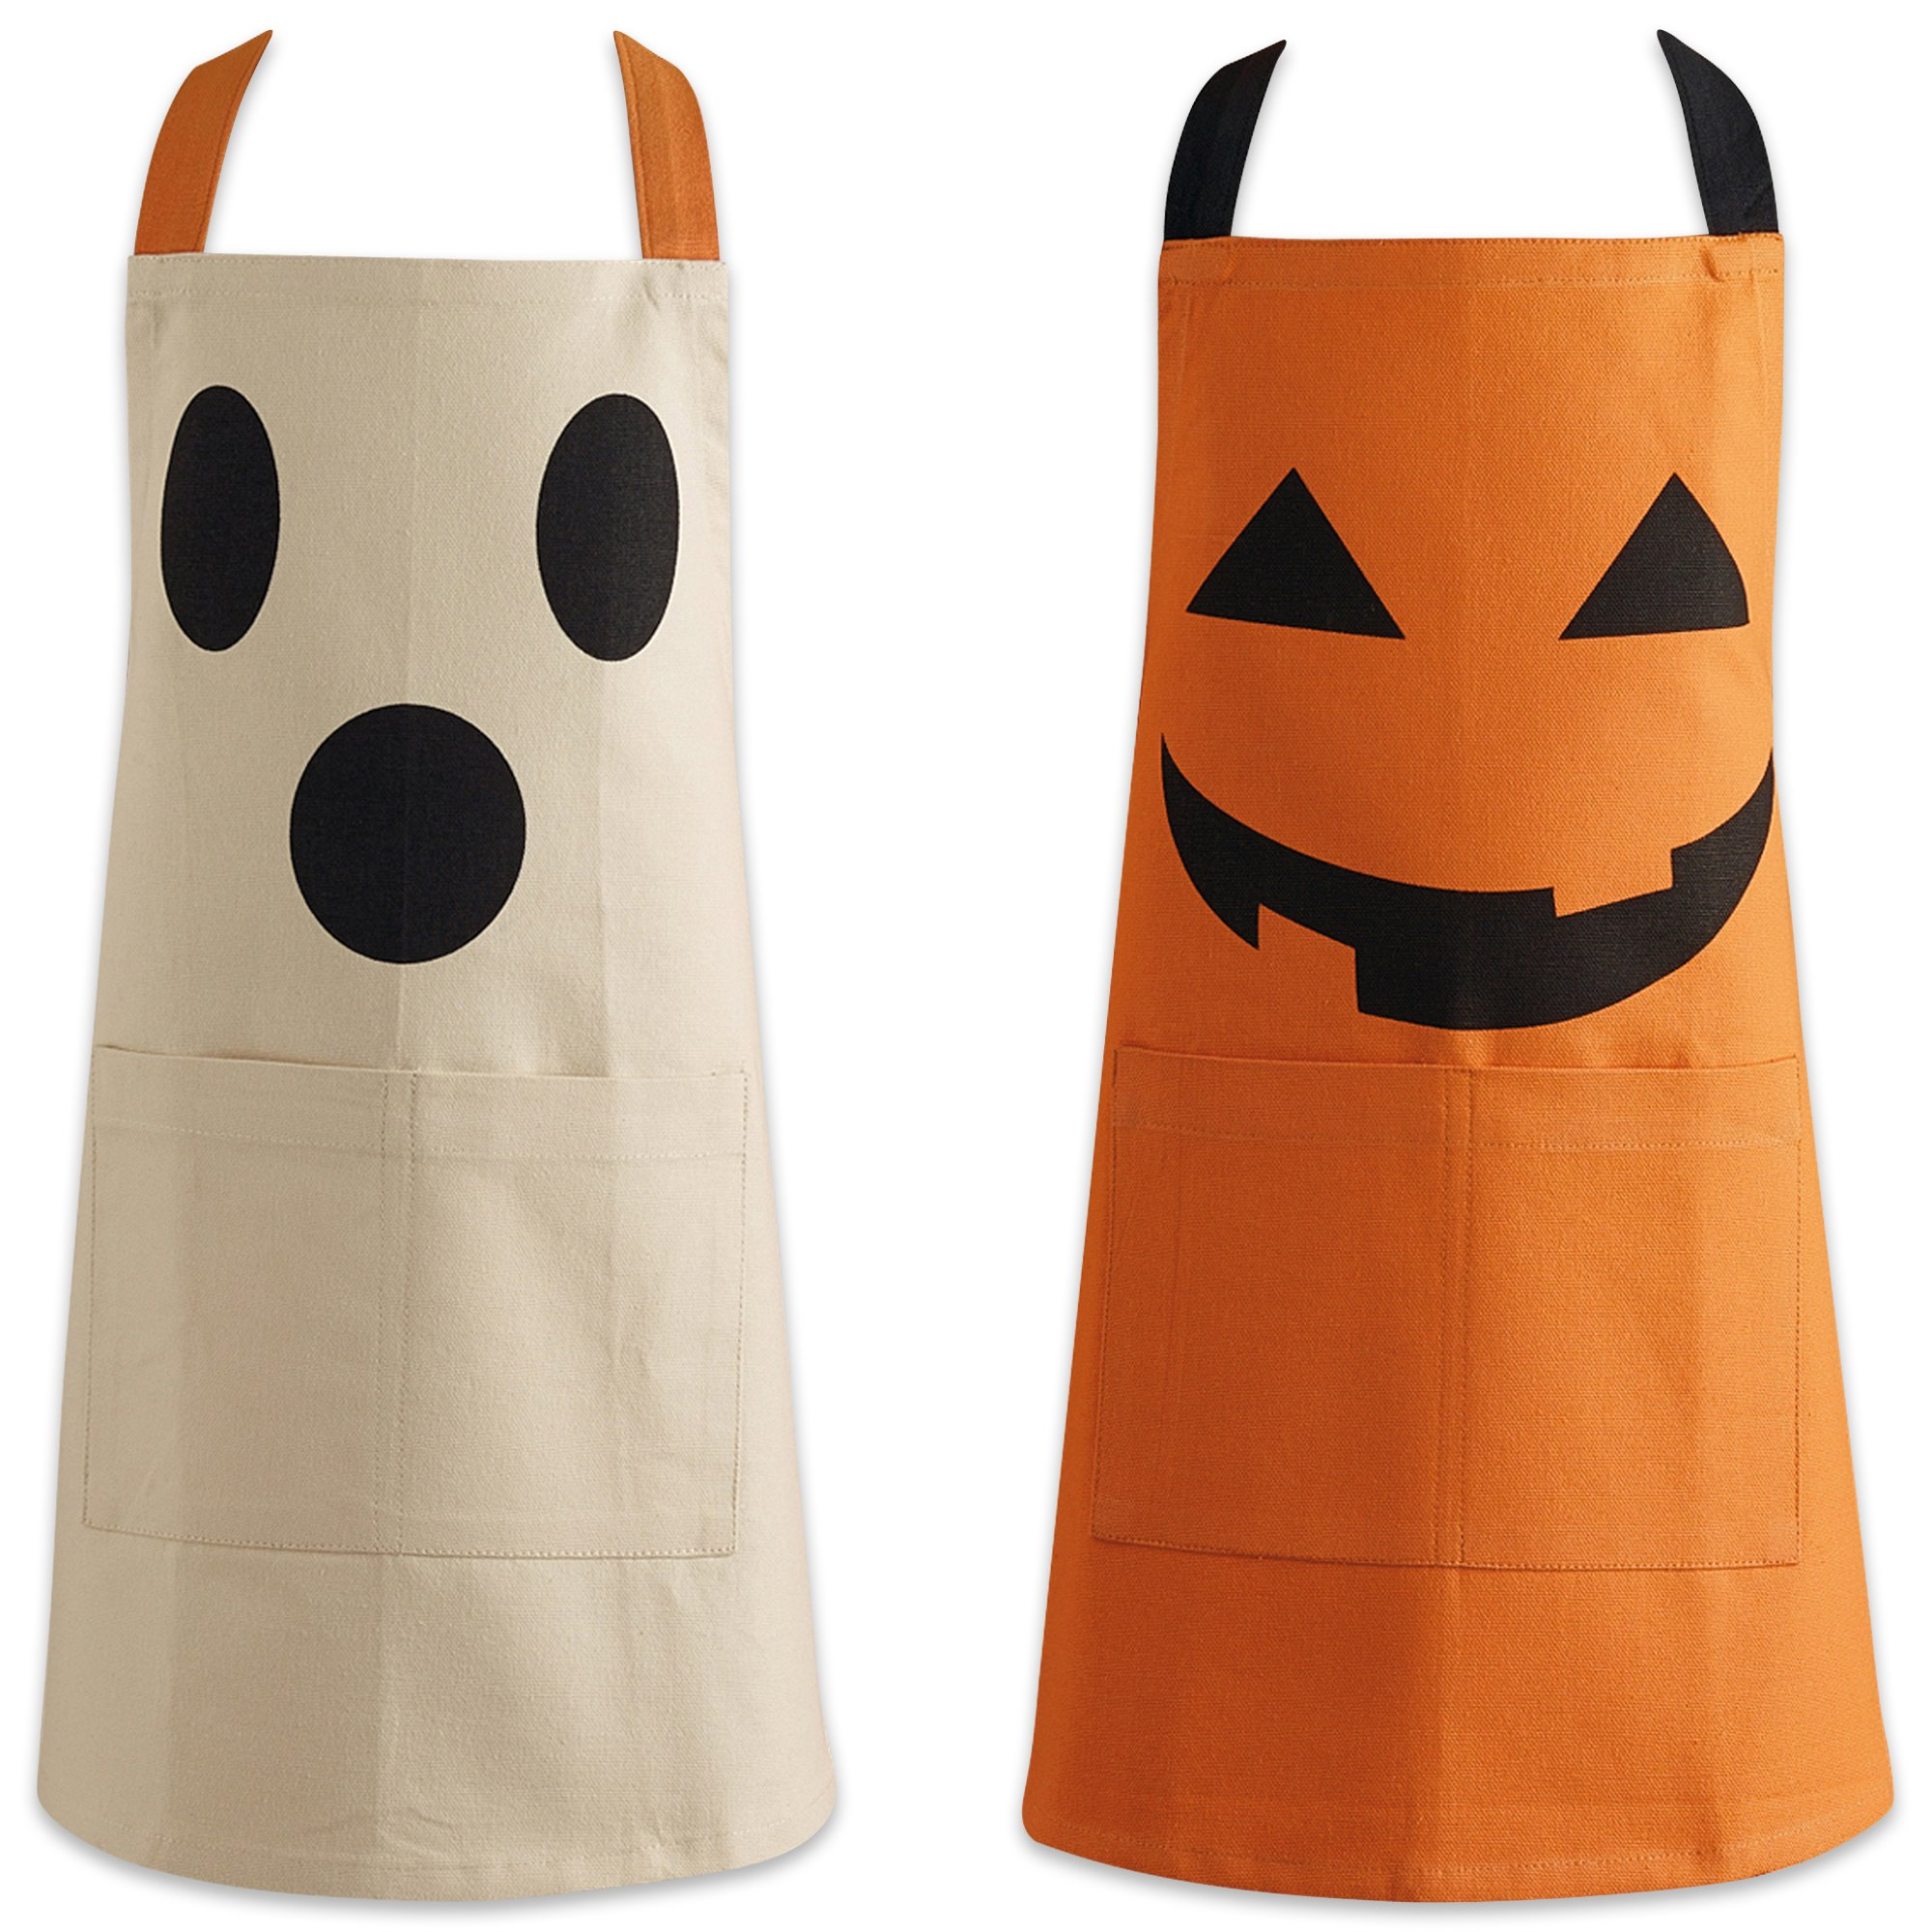 DII CAMZ10225 Halloween Children Apron (Set of 2), 17 x 21, Black